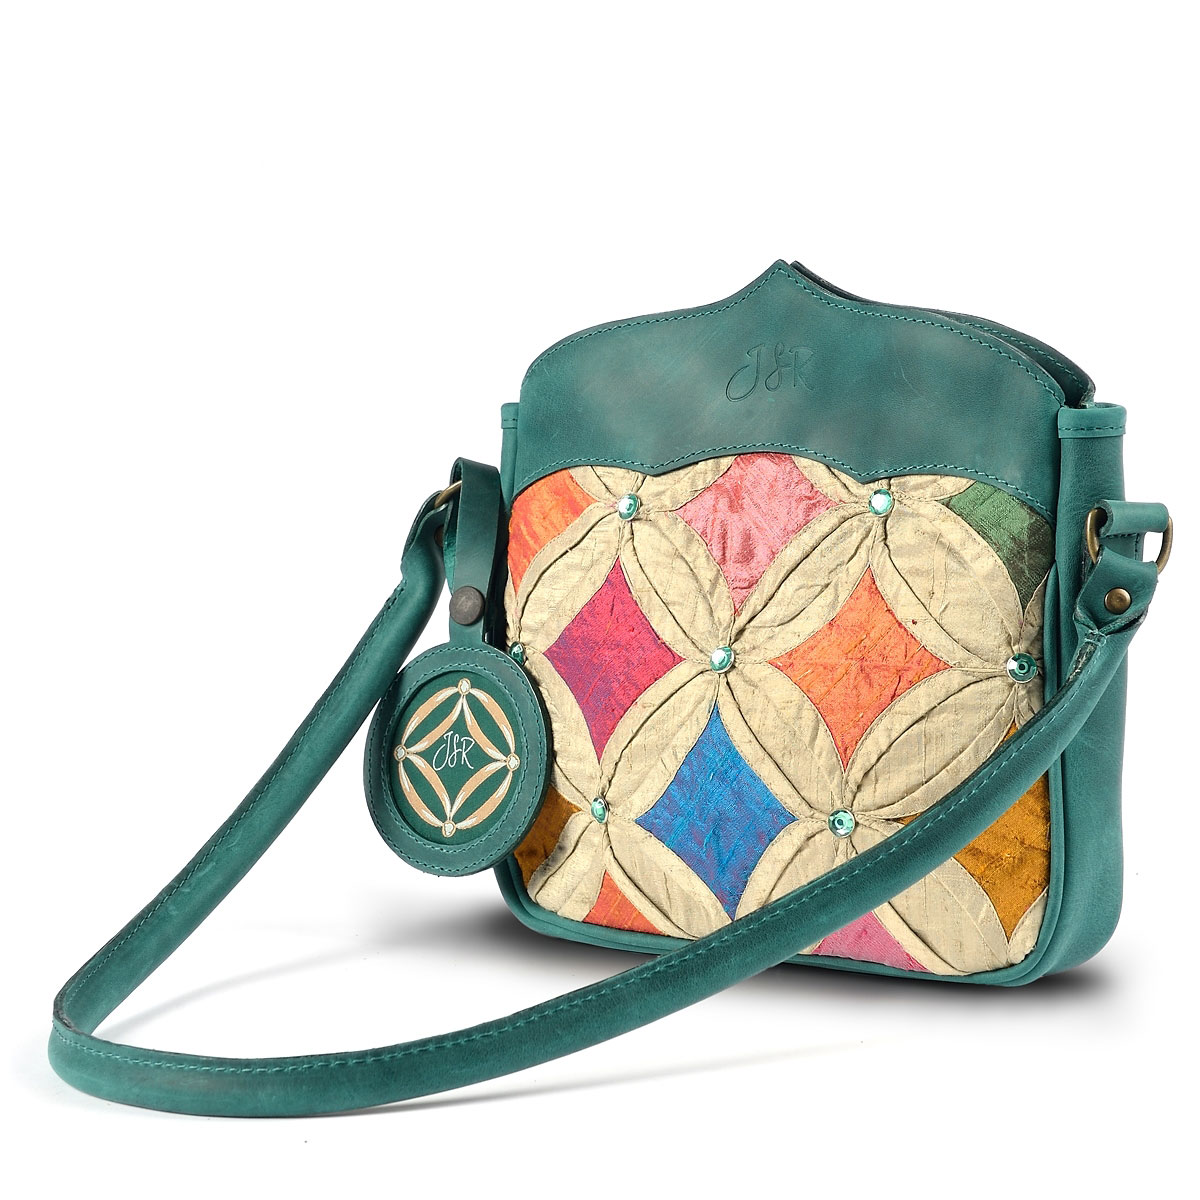 Green Jewel shoulder bag